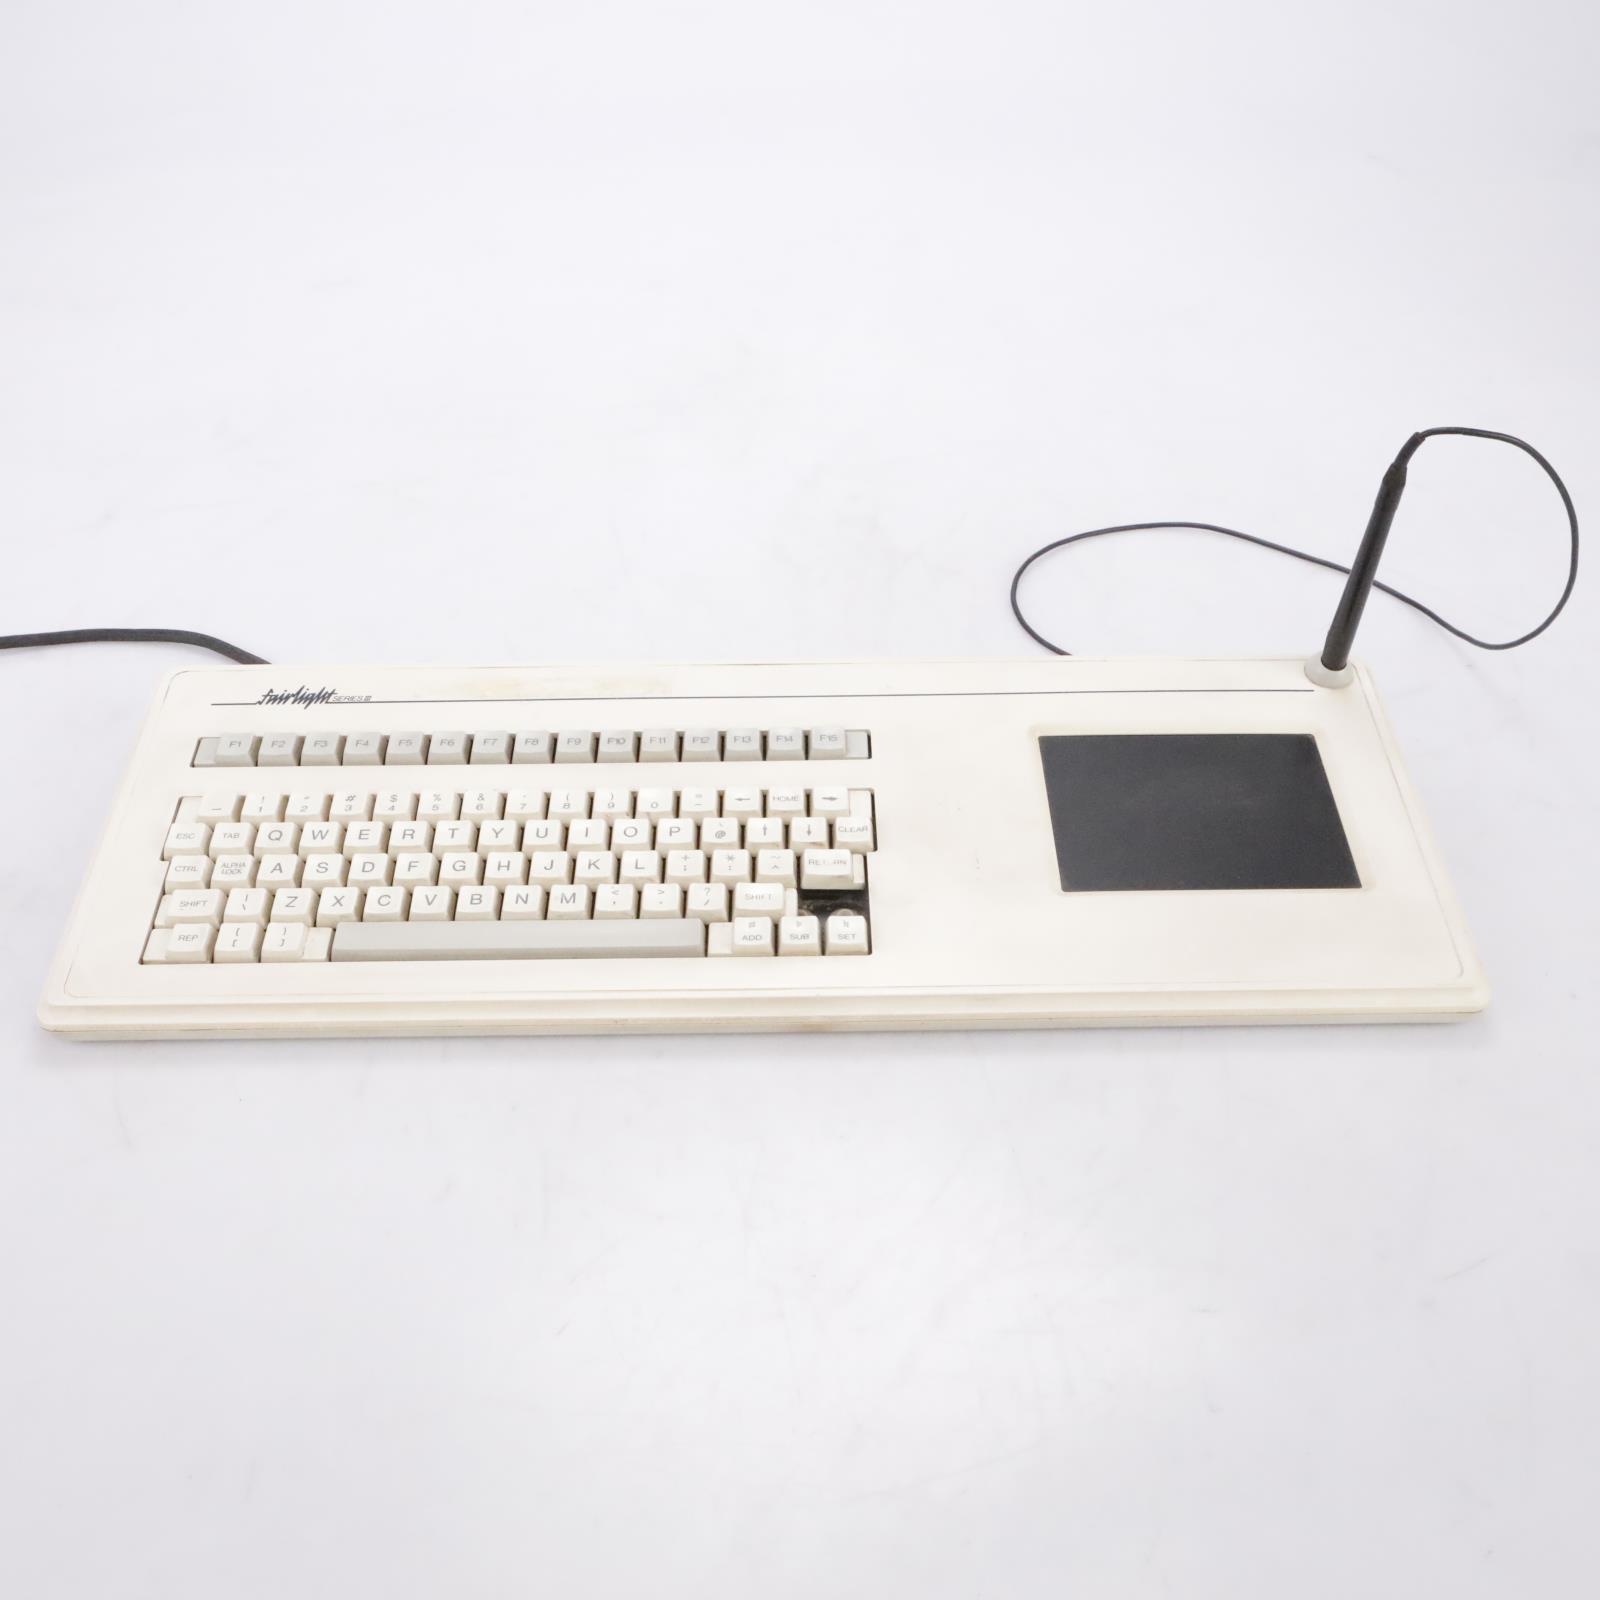 Vintage Fairlight CMI Series III Computer Keyboard #43513